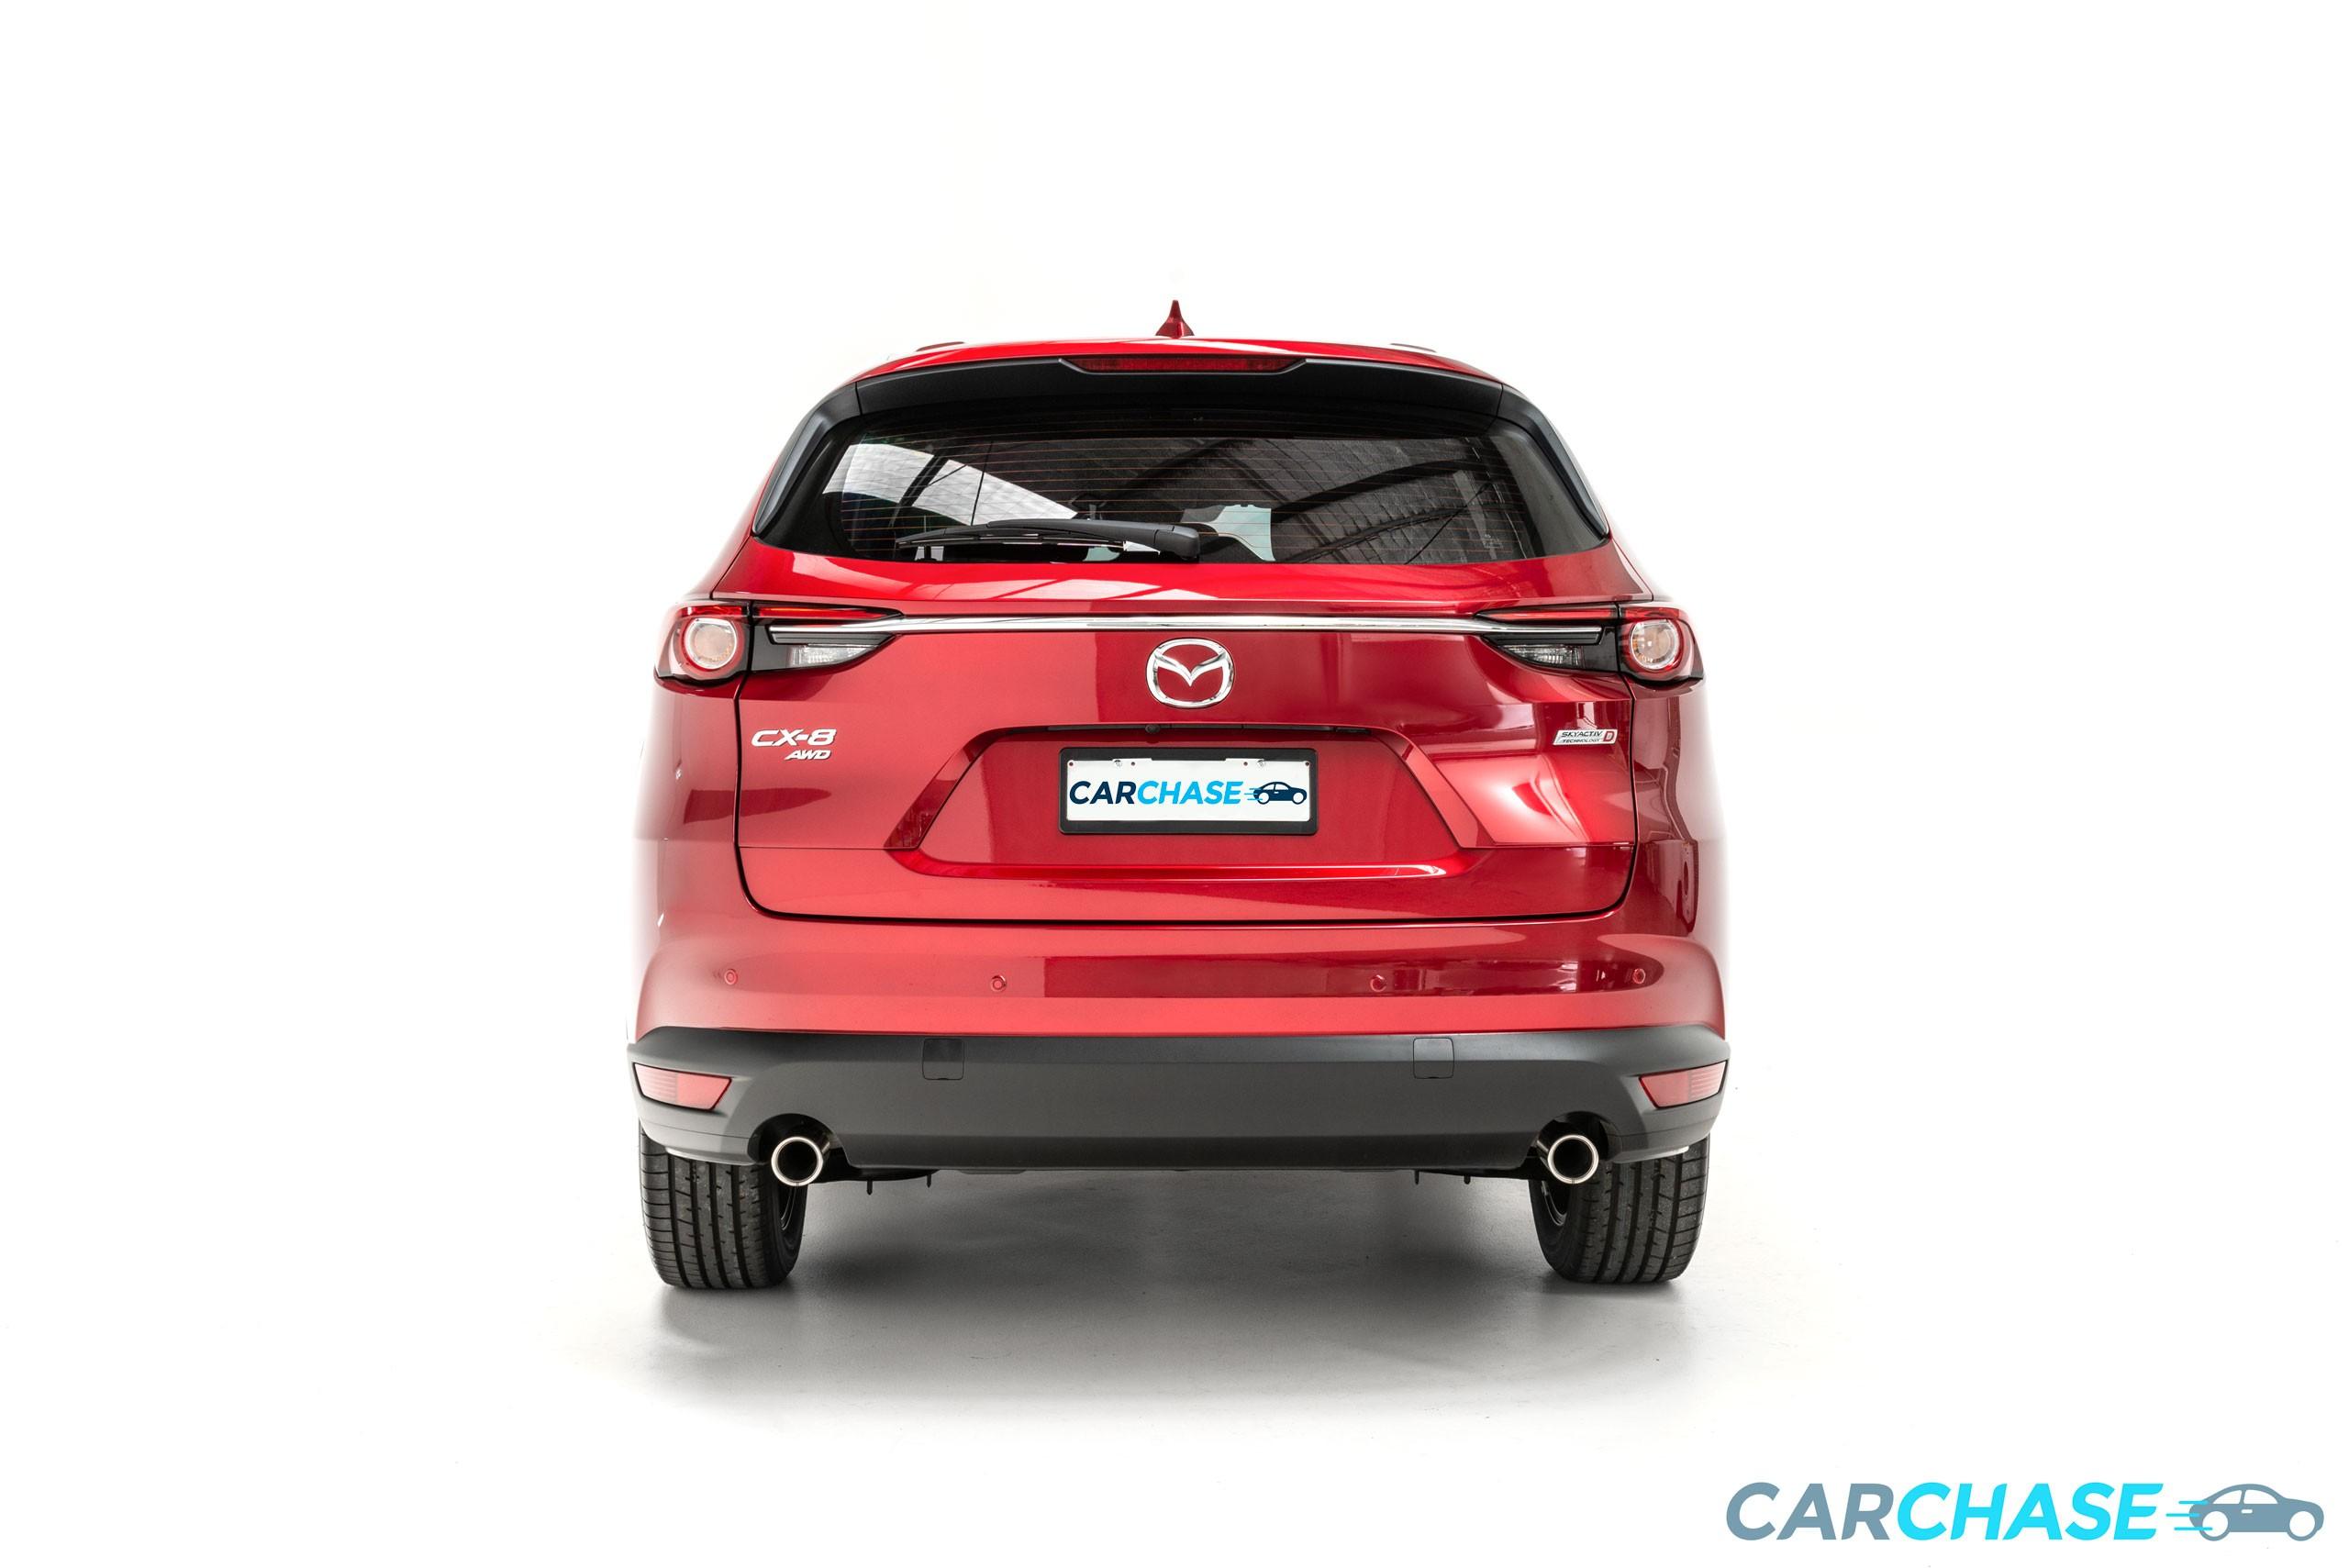 Image of rear profile of 2018 Mazda CX-8 Asaki